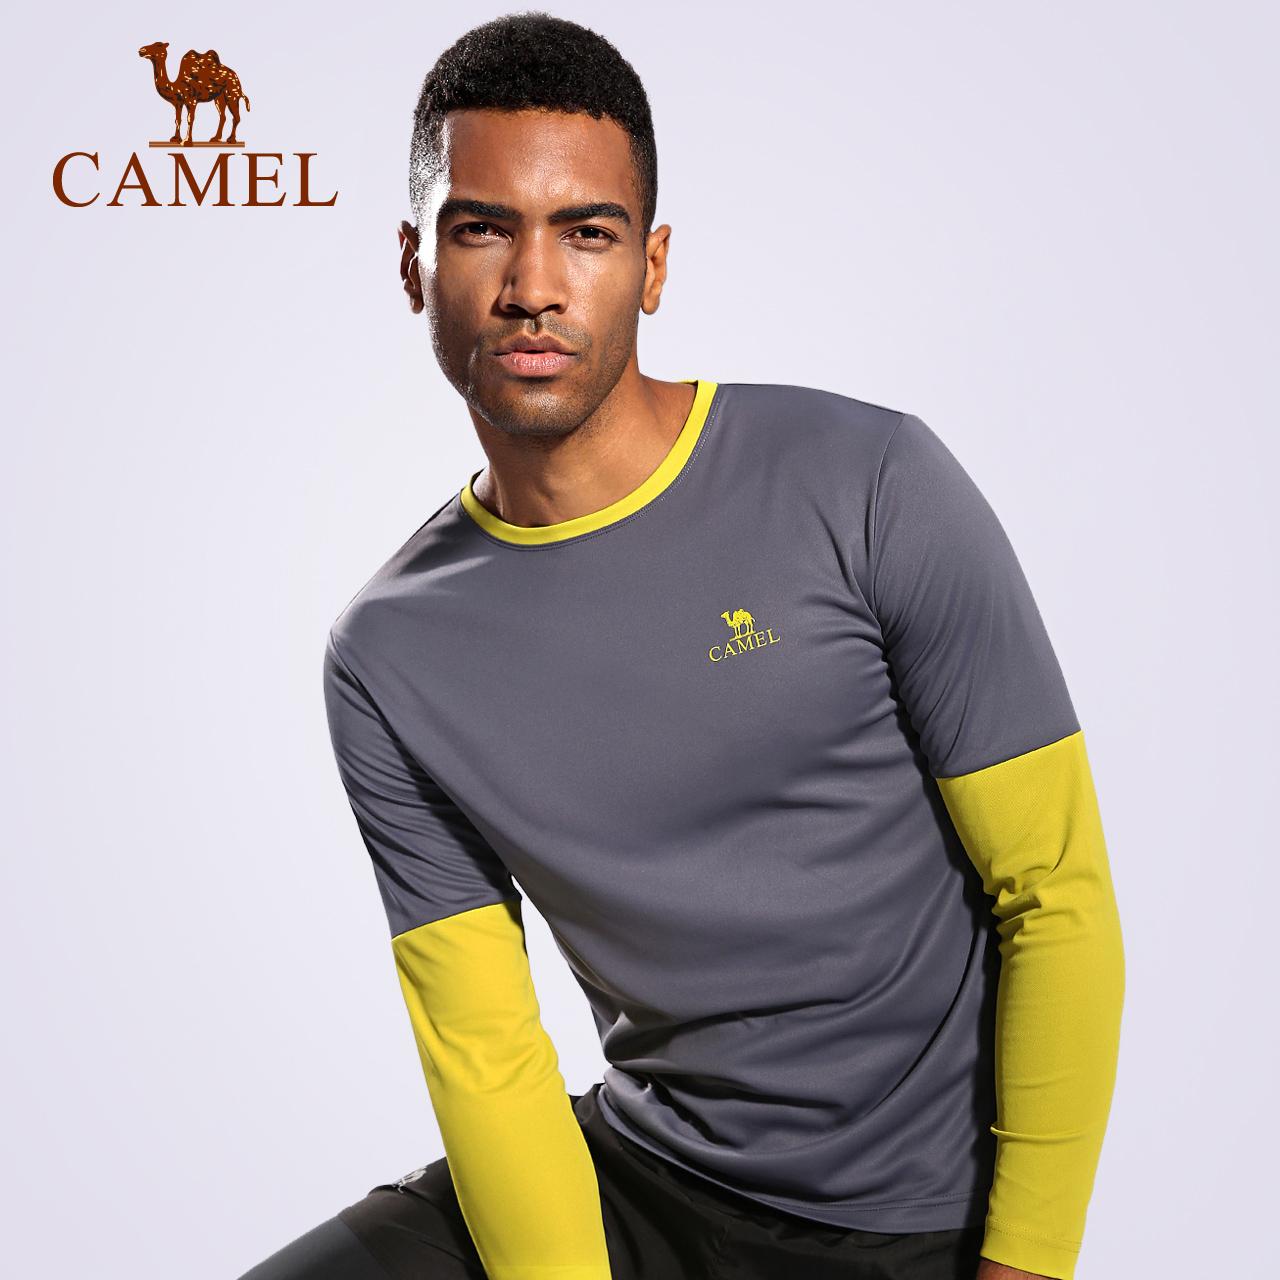 camel/骆驼运动卫衣男款 运动弹力长袖跑步上衣 休闲服运动健身衣